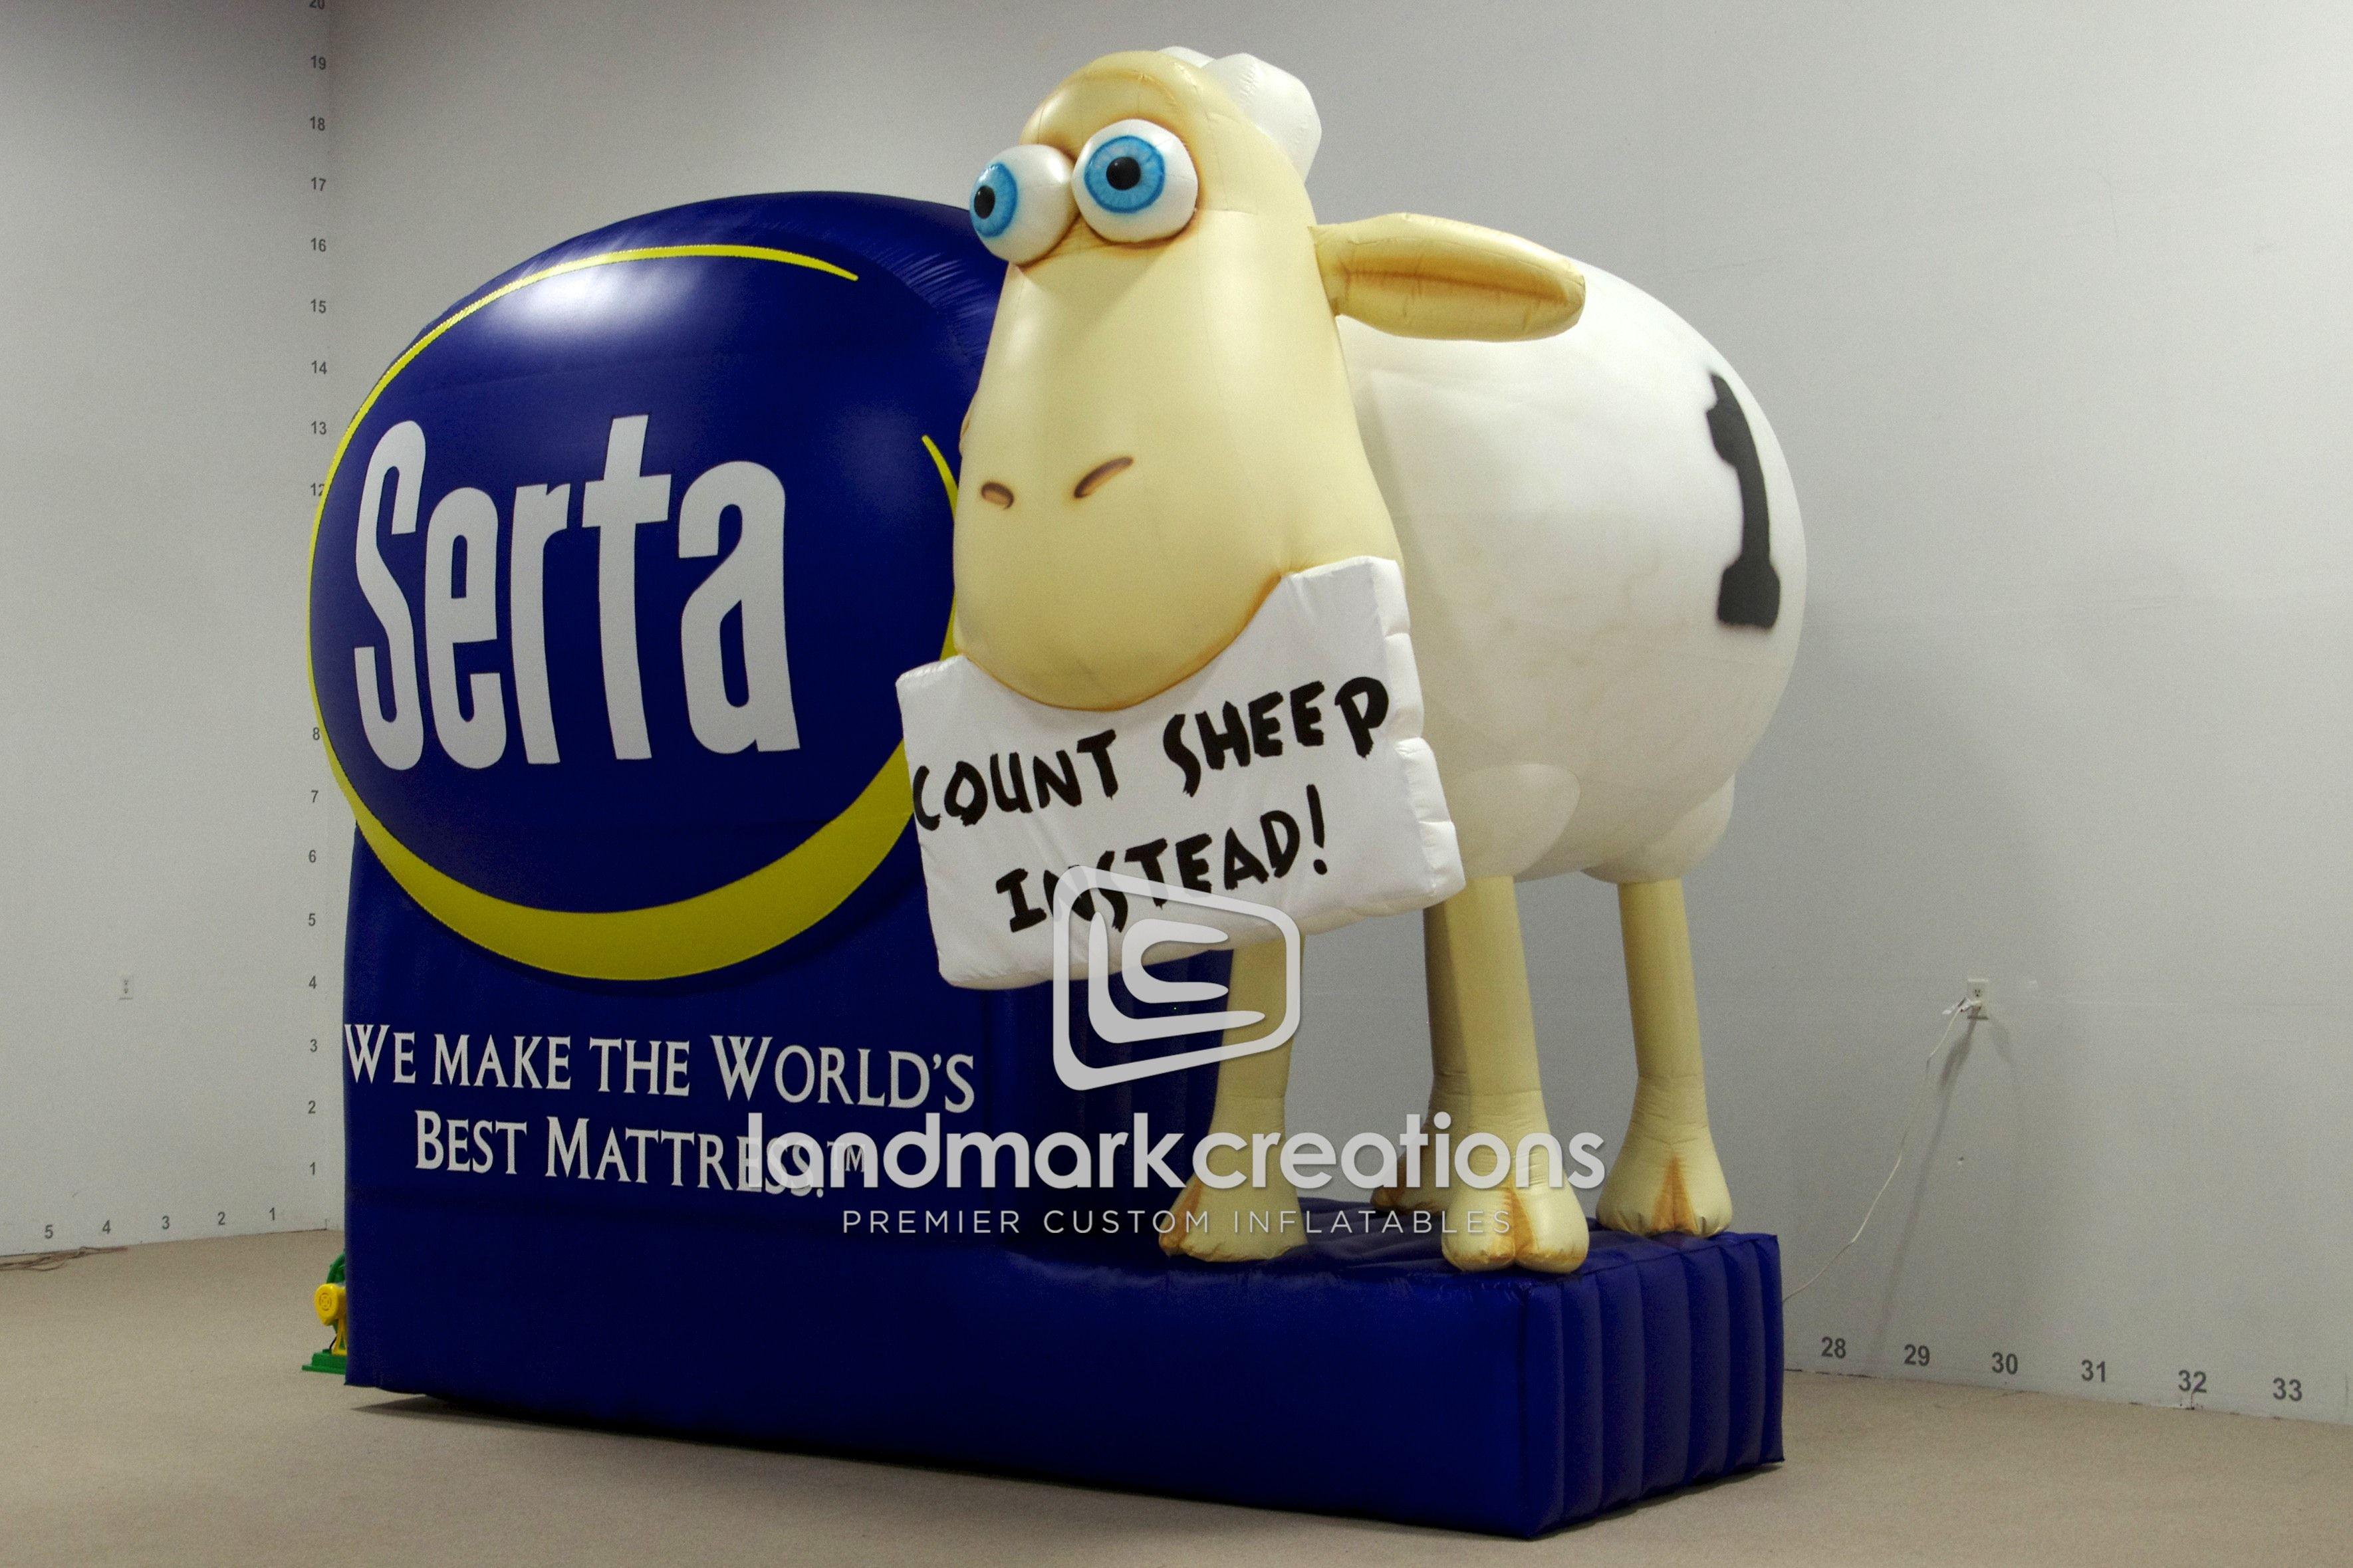 Serta Mattress Mattress Counting Sheep Mascot Billboard Inflatable